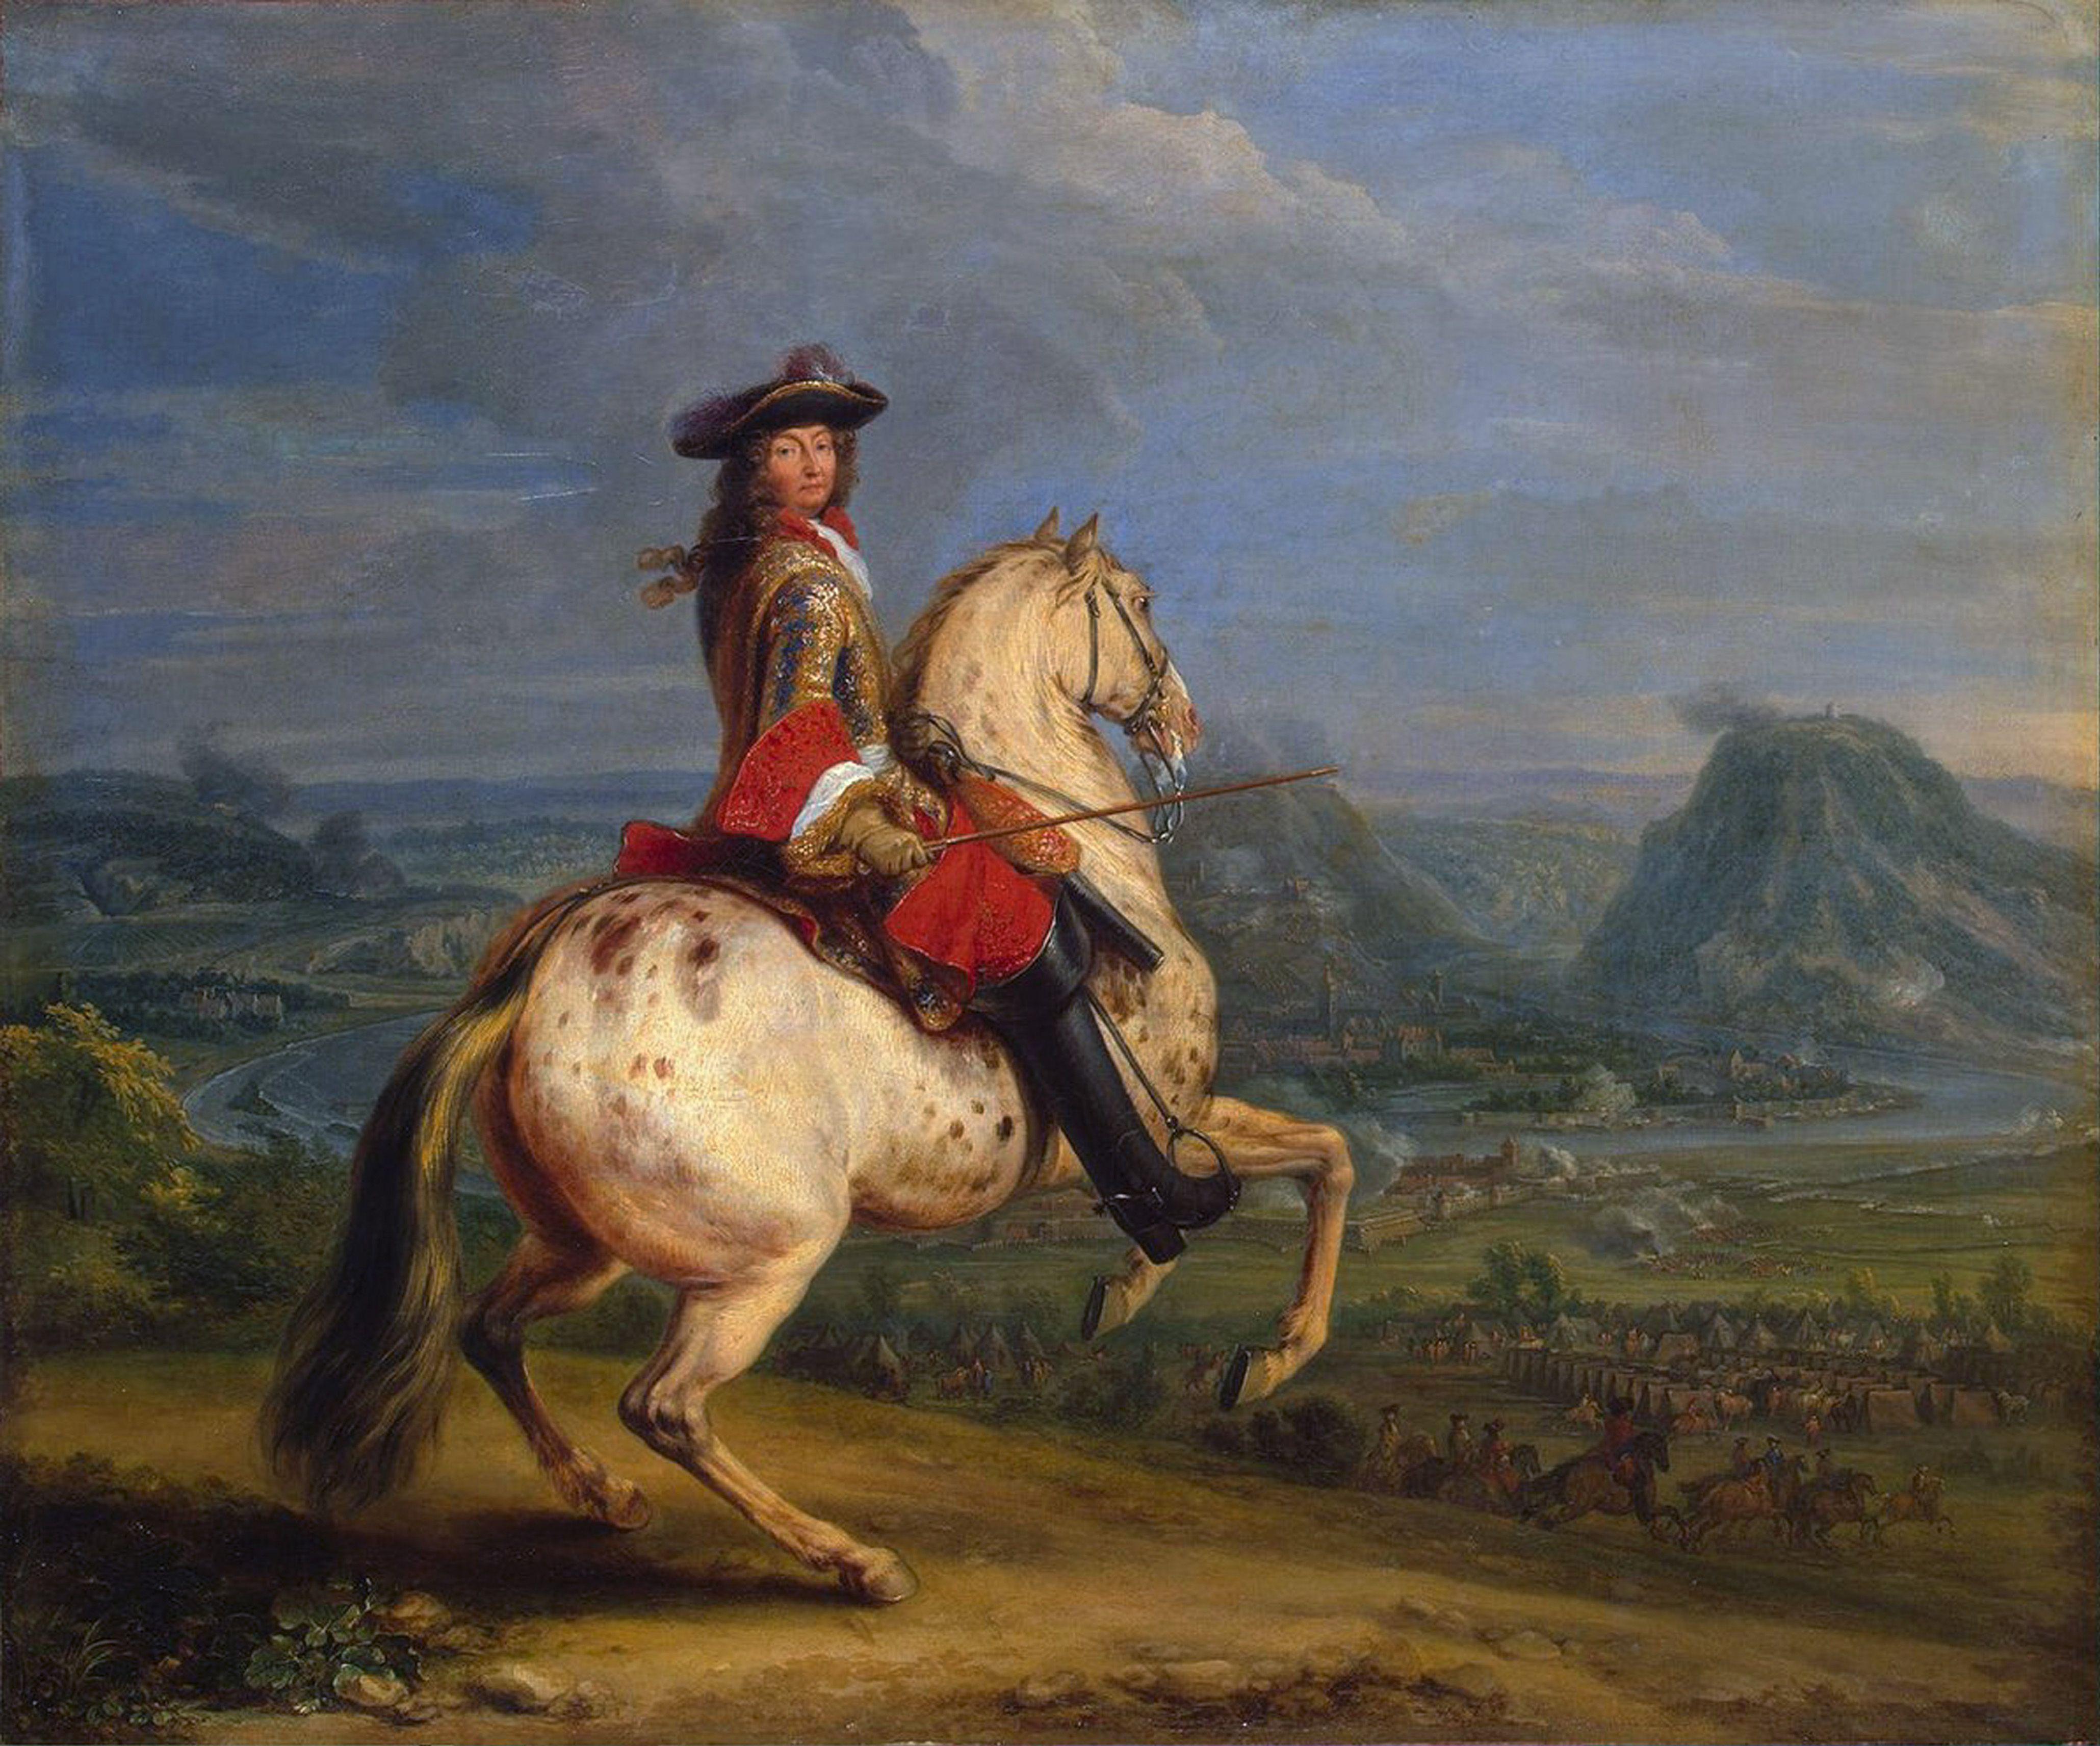 Louis XIV at the Taking of Besançon', 1674.